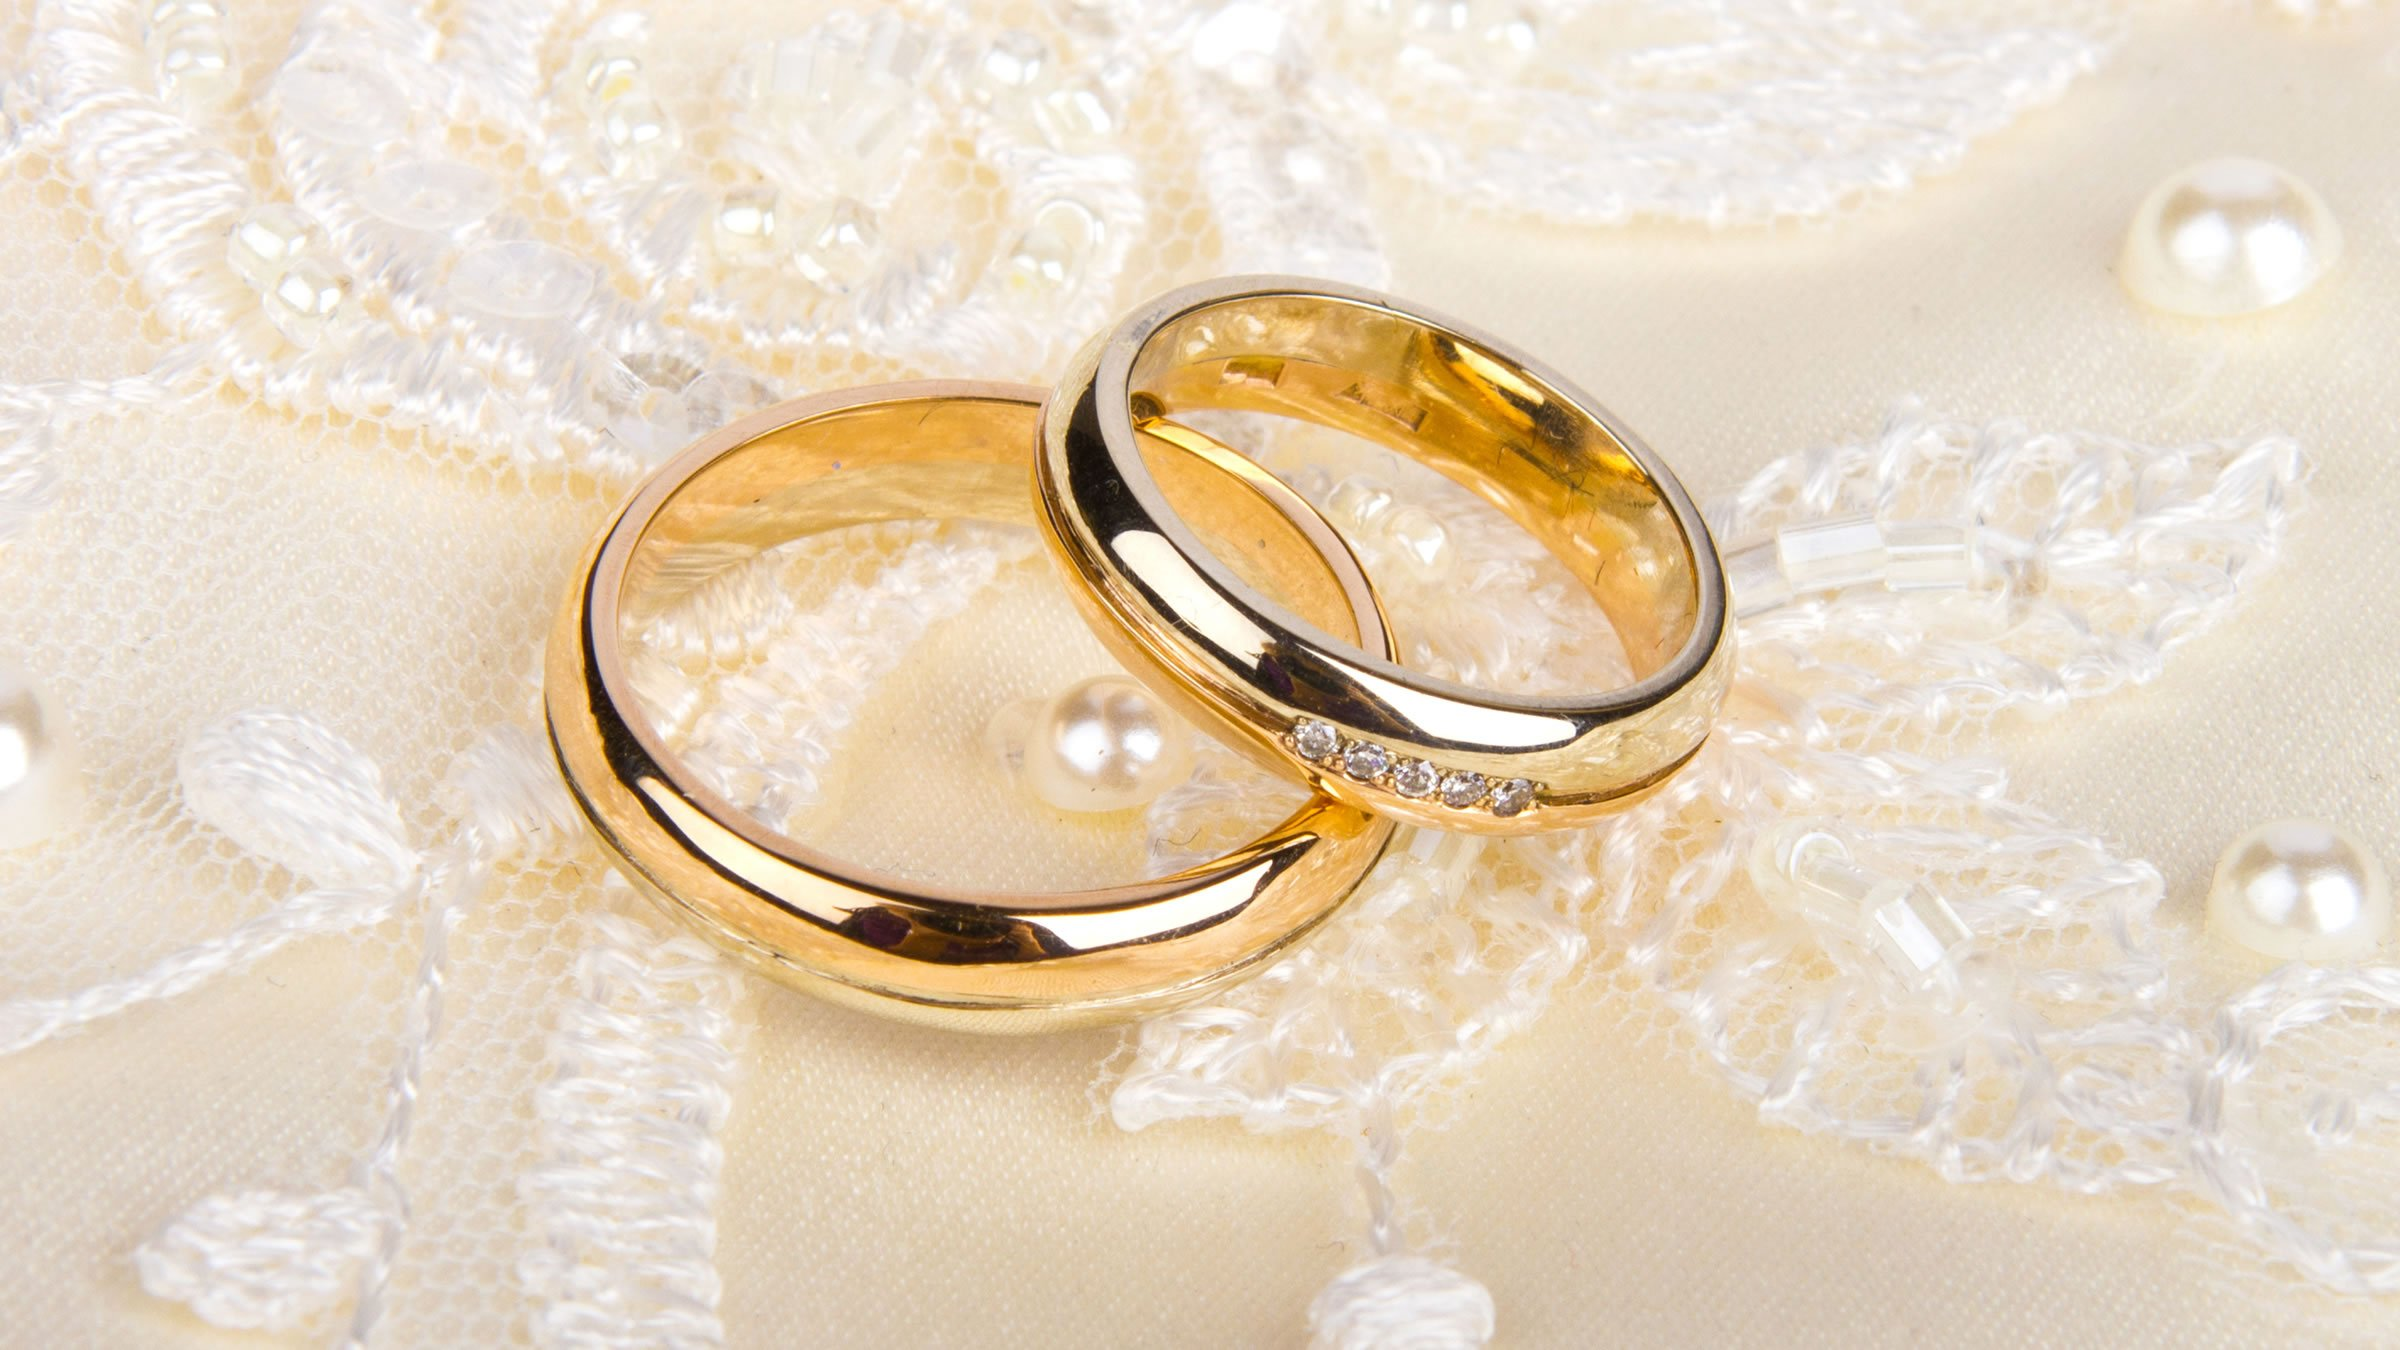 Matrimonio Civil O Religioso Biblia : La importancia del matrimonio en italia